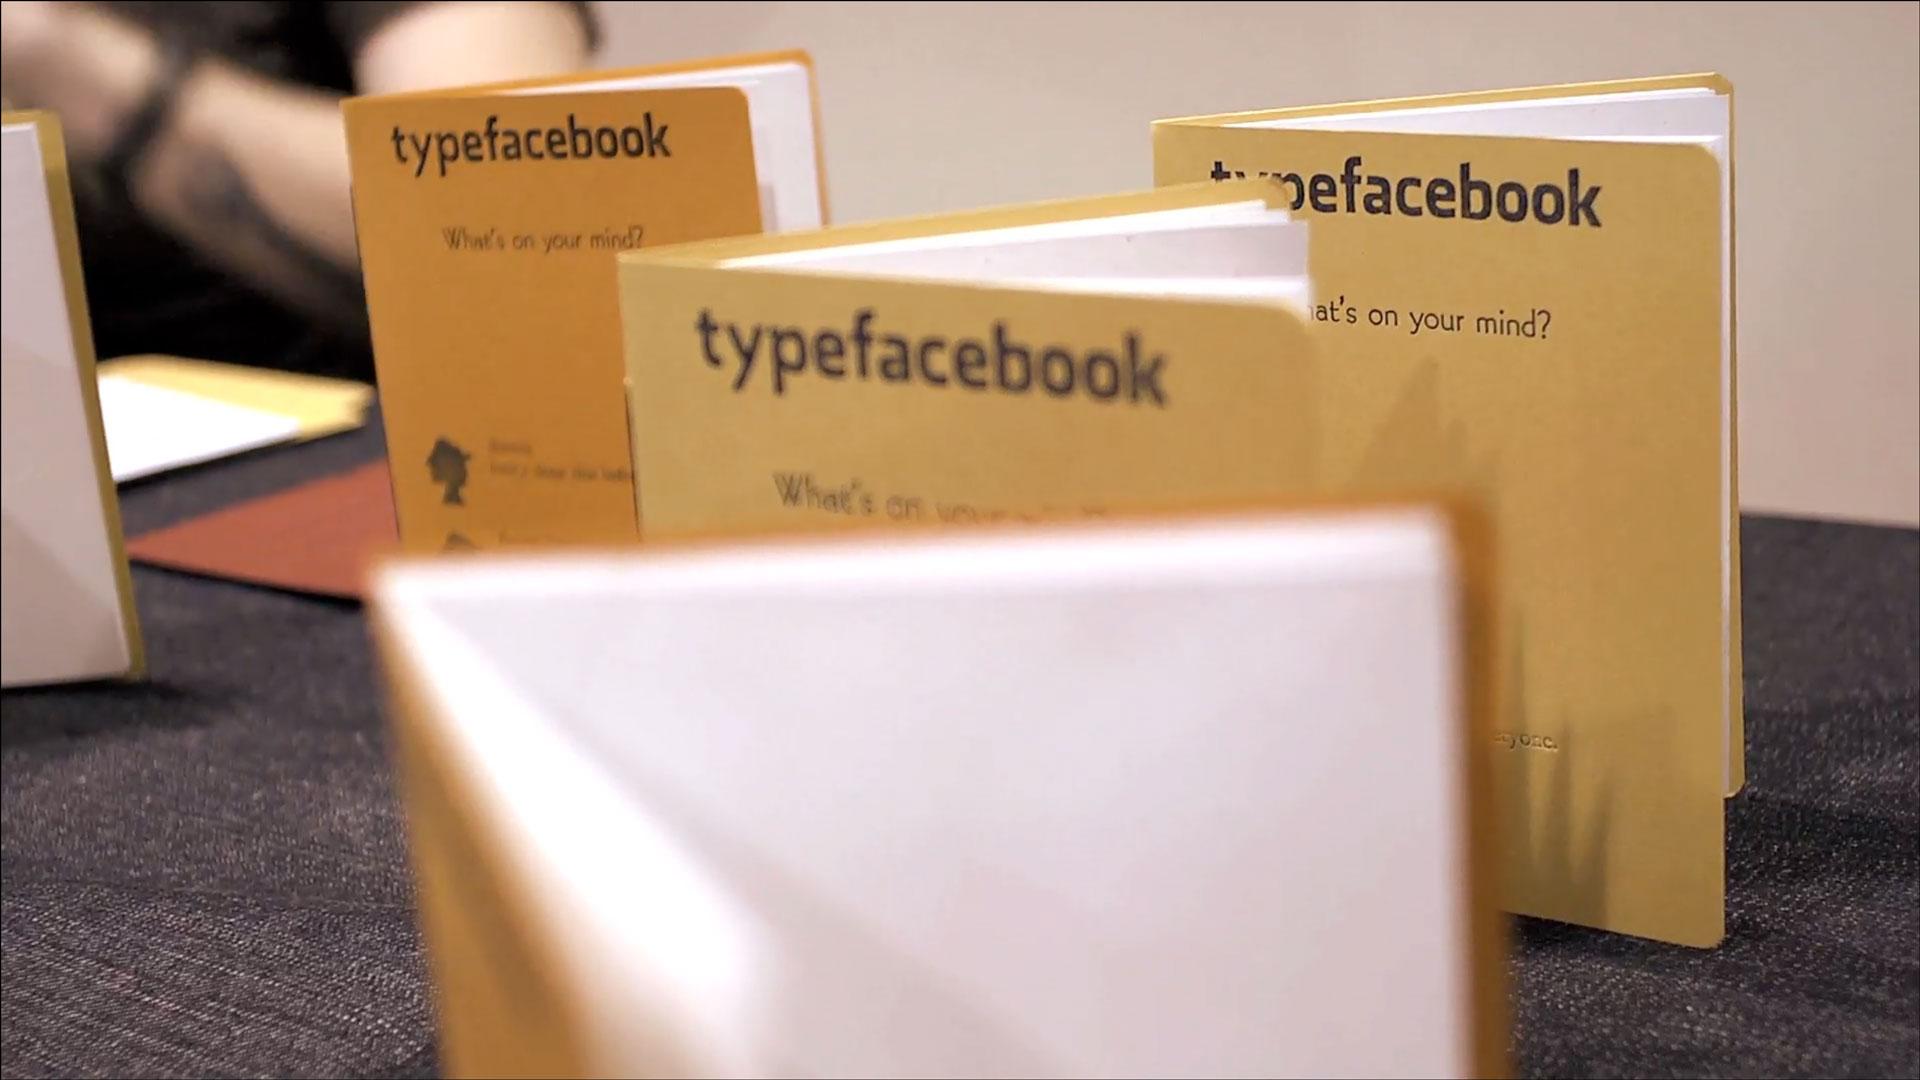 4946-Typefacebook.jpg